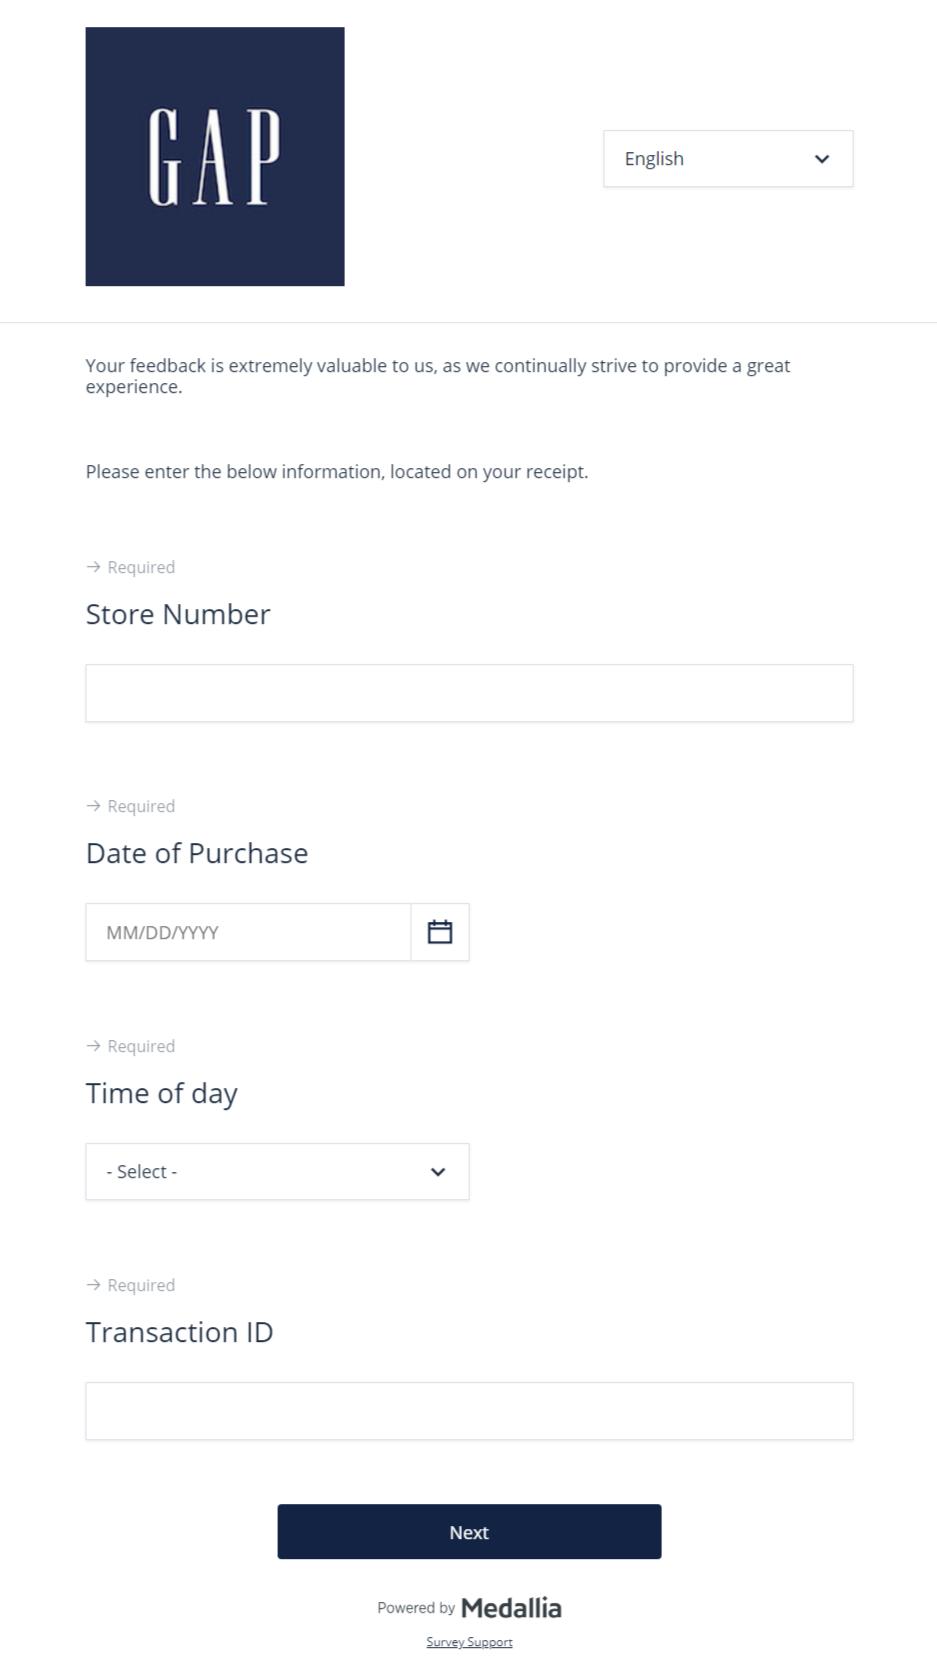 Gap Customer Survey